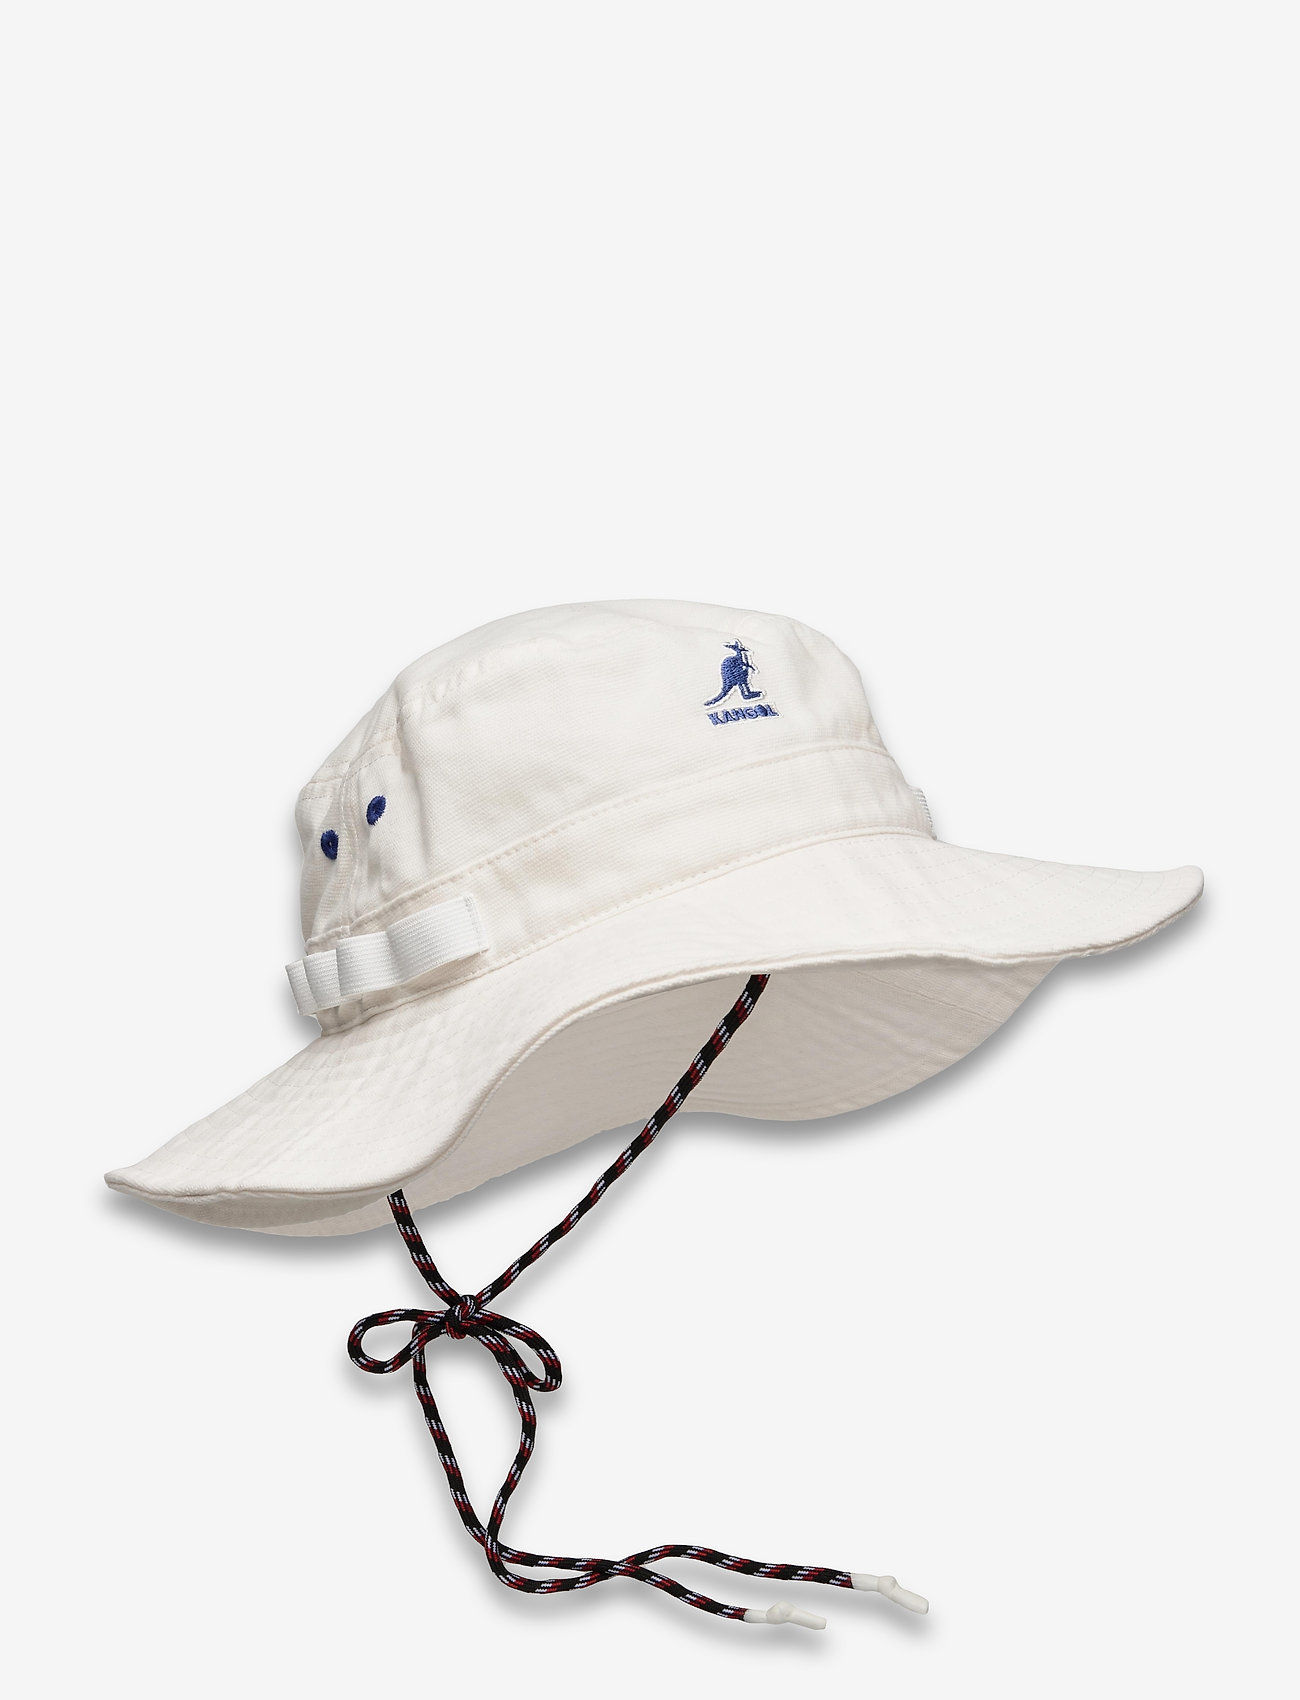 Kangol - KG UTILITY CORDS JUNGLE HAT - off white - 0